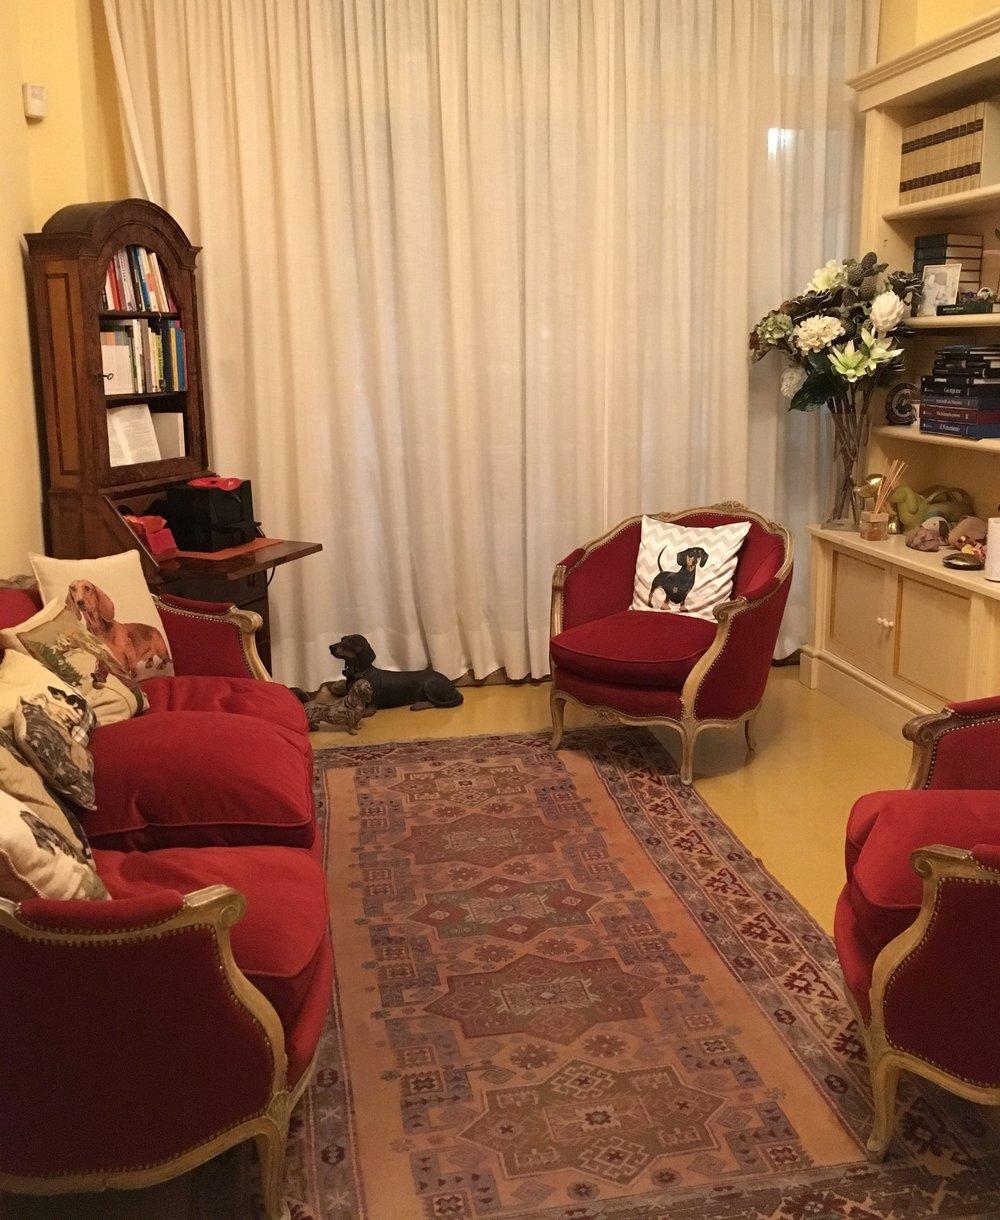 B&B Palazzo Trevi